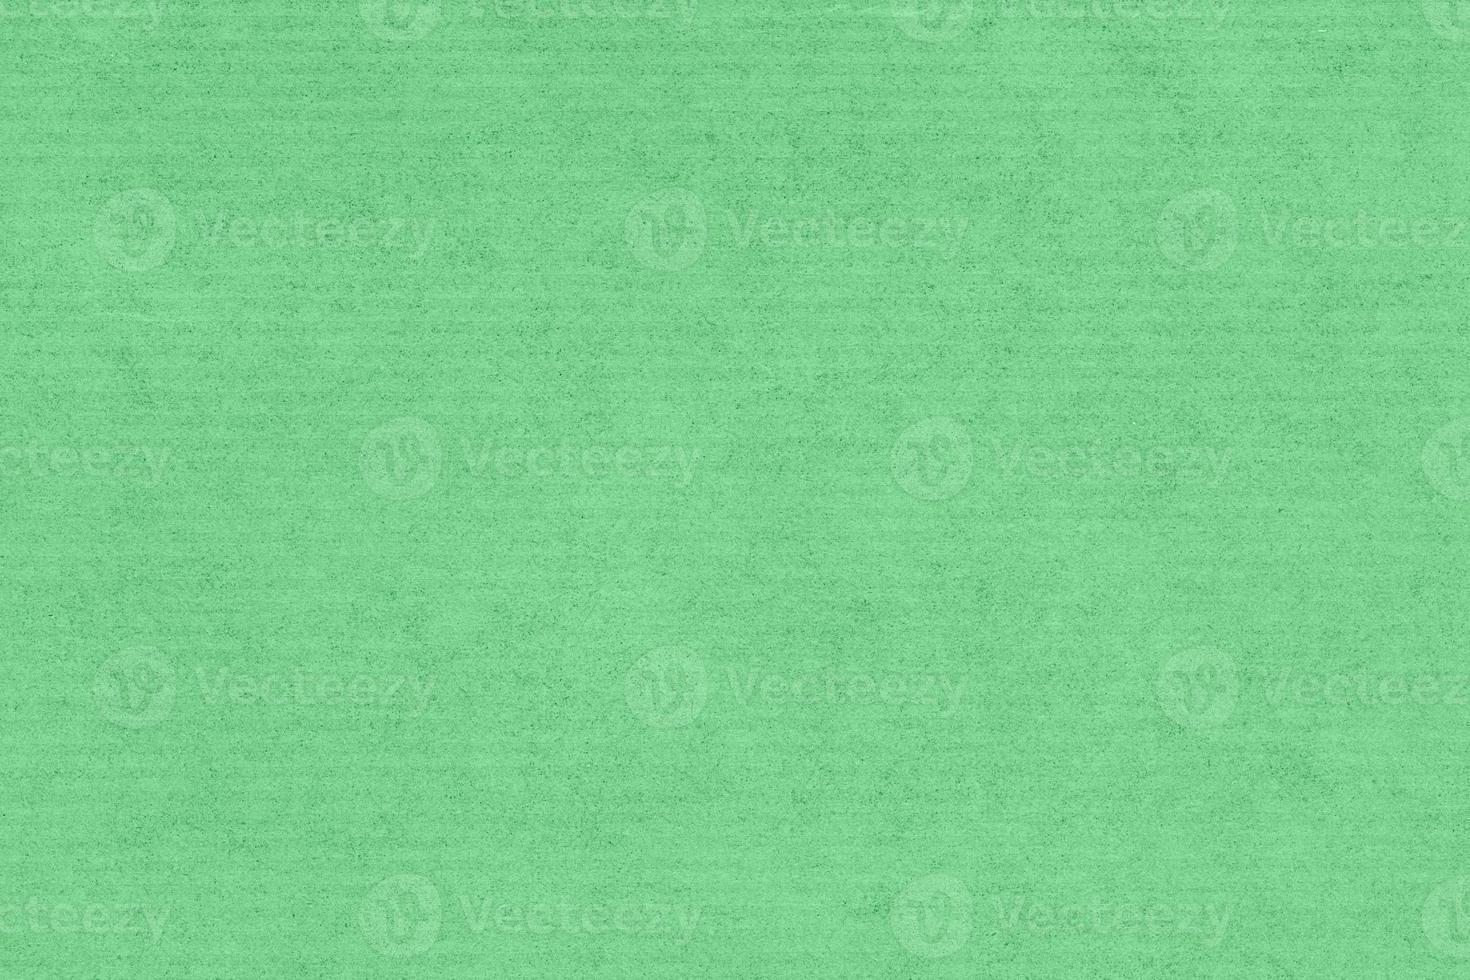 fundo de textura de papel kraft. cor verde foto